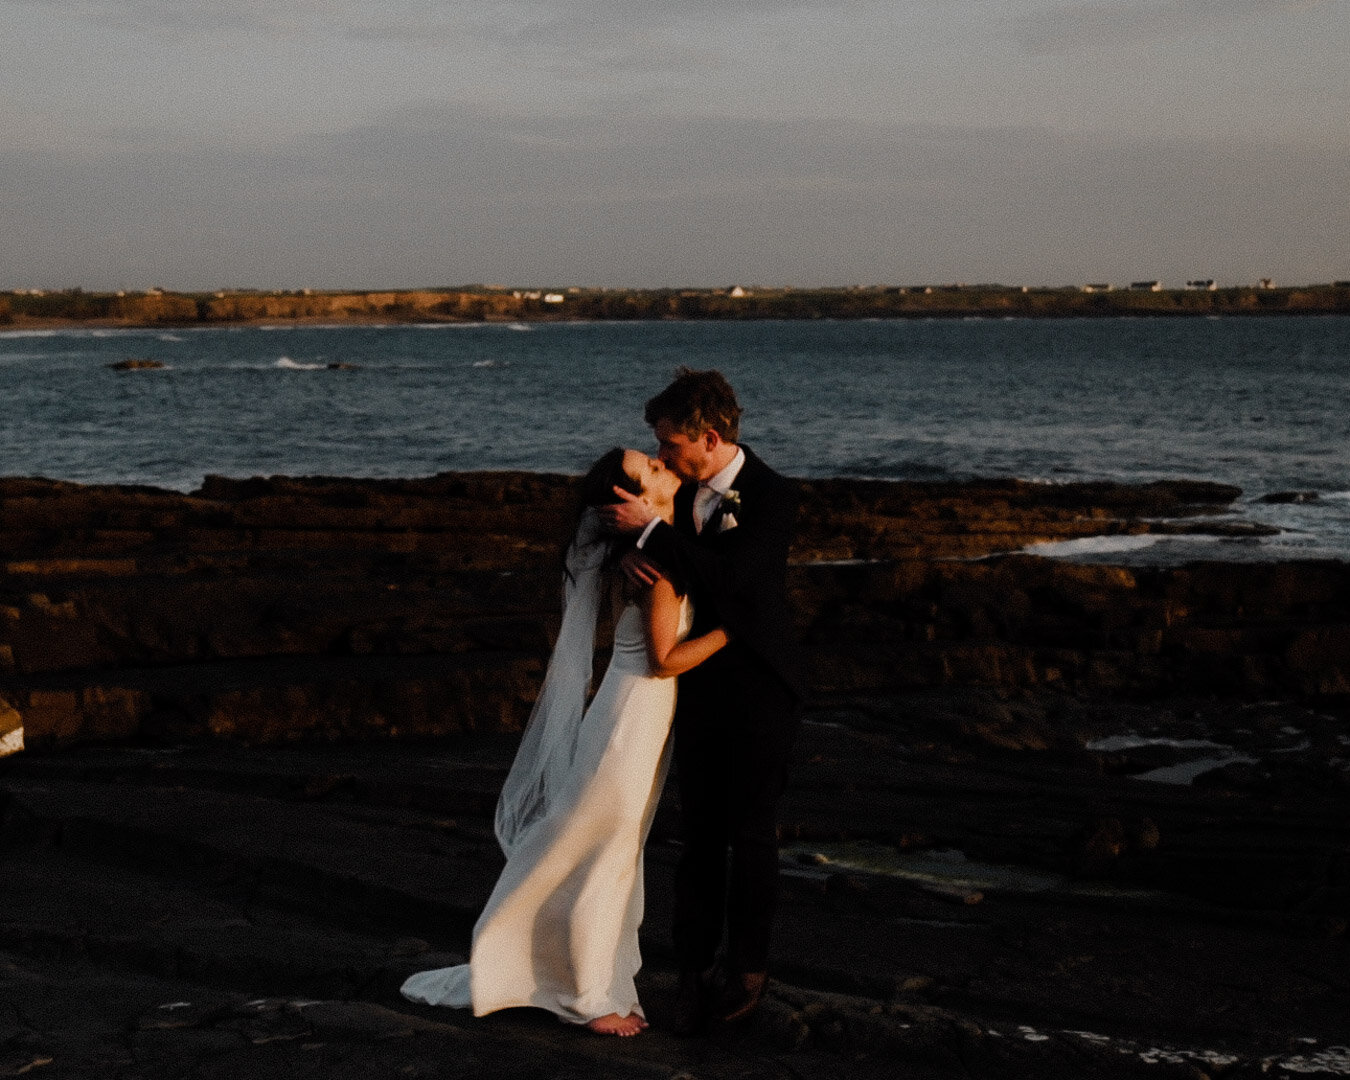 Sunset, luxury wedding couple, alexandra grecco dress